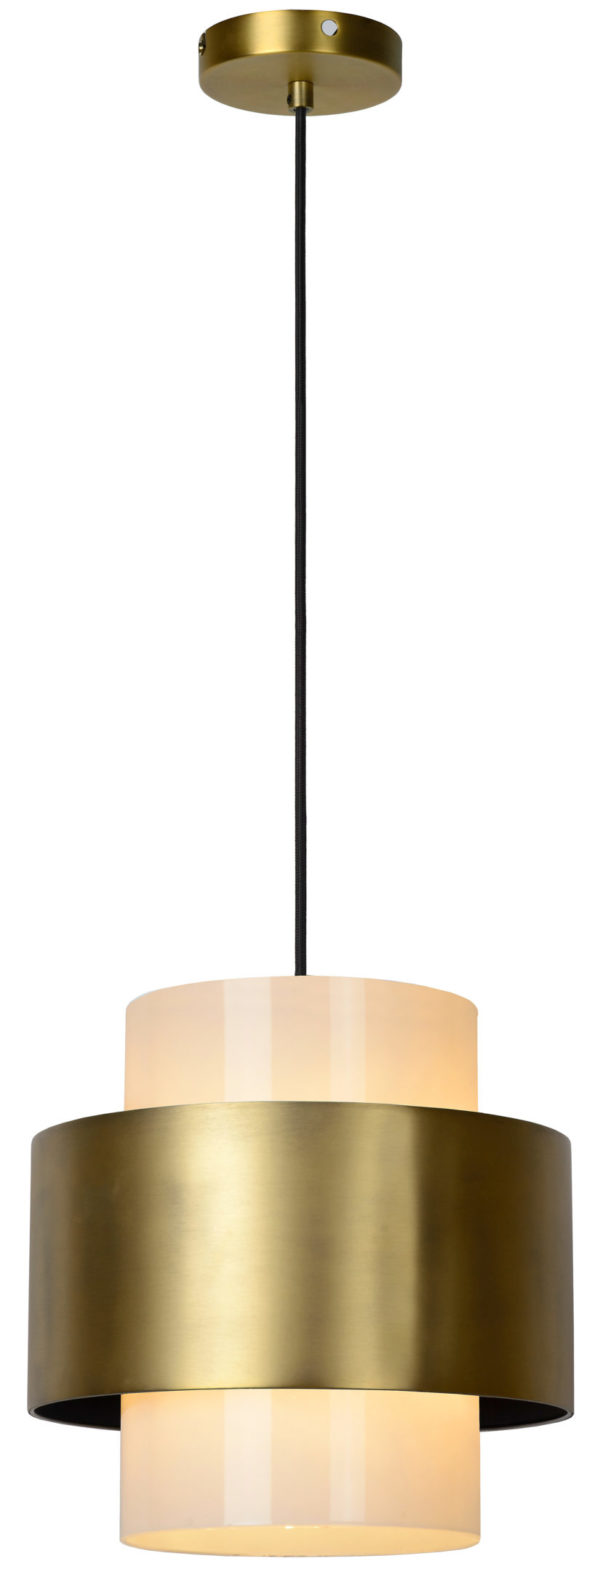 Firmin hanglamp - opaal Lucide Hanglamp 45497/30/02